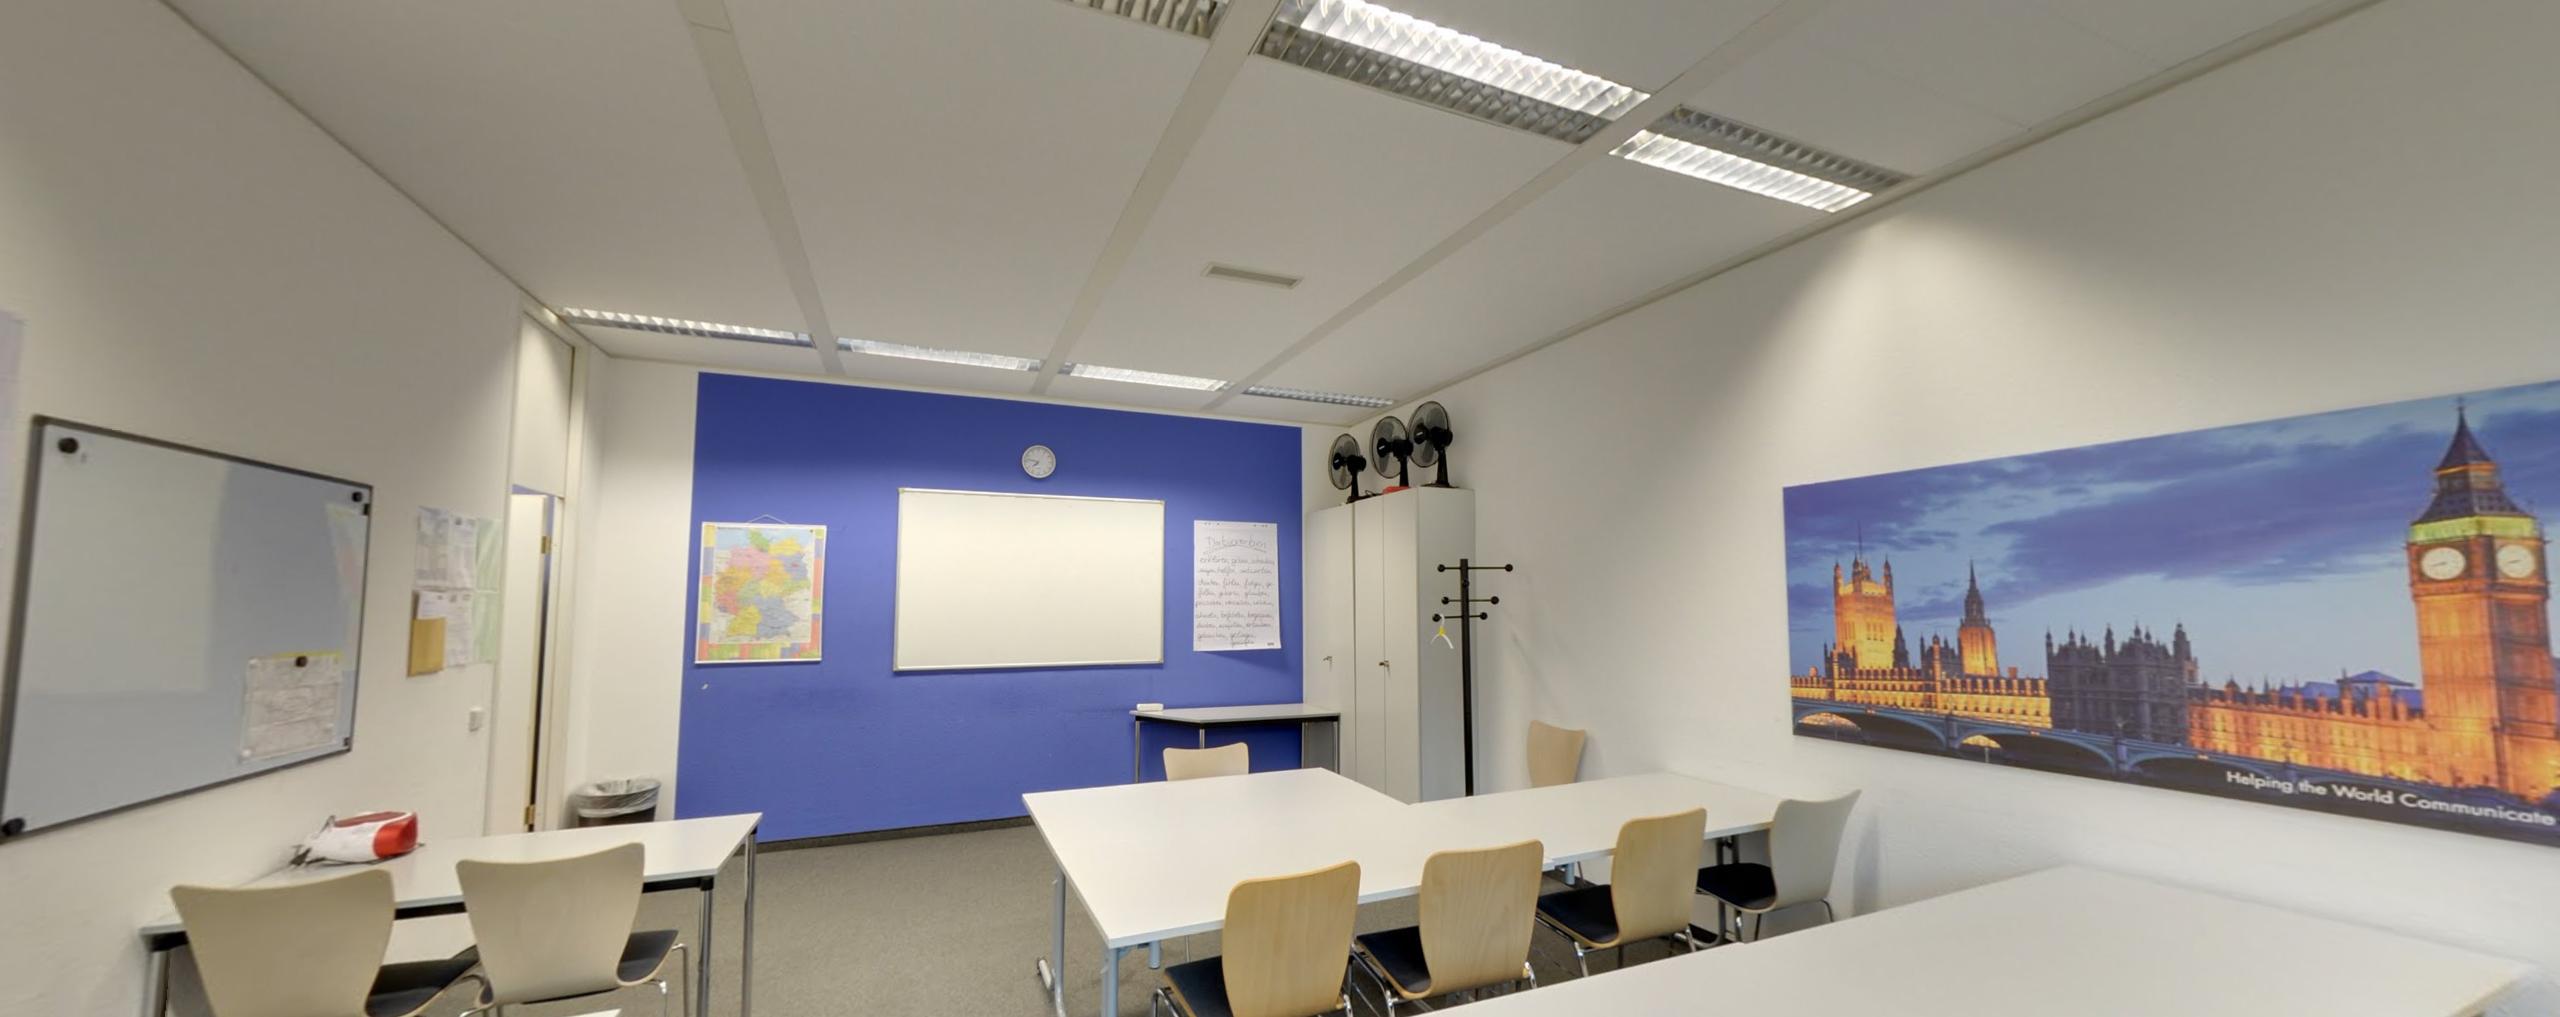 Berlitz Sprachschule Hannover